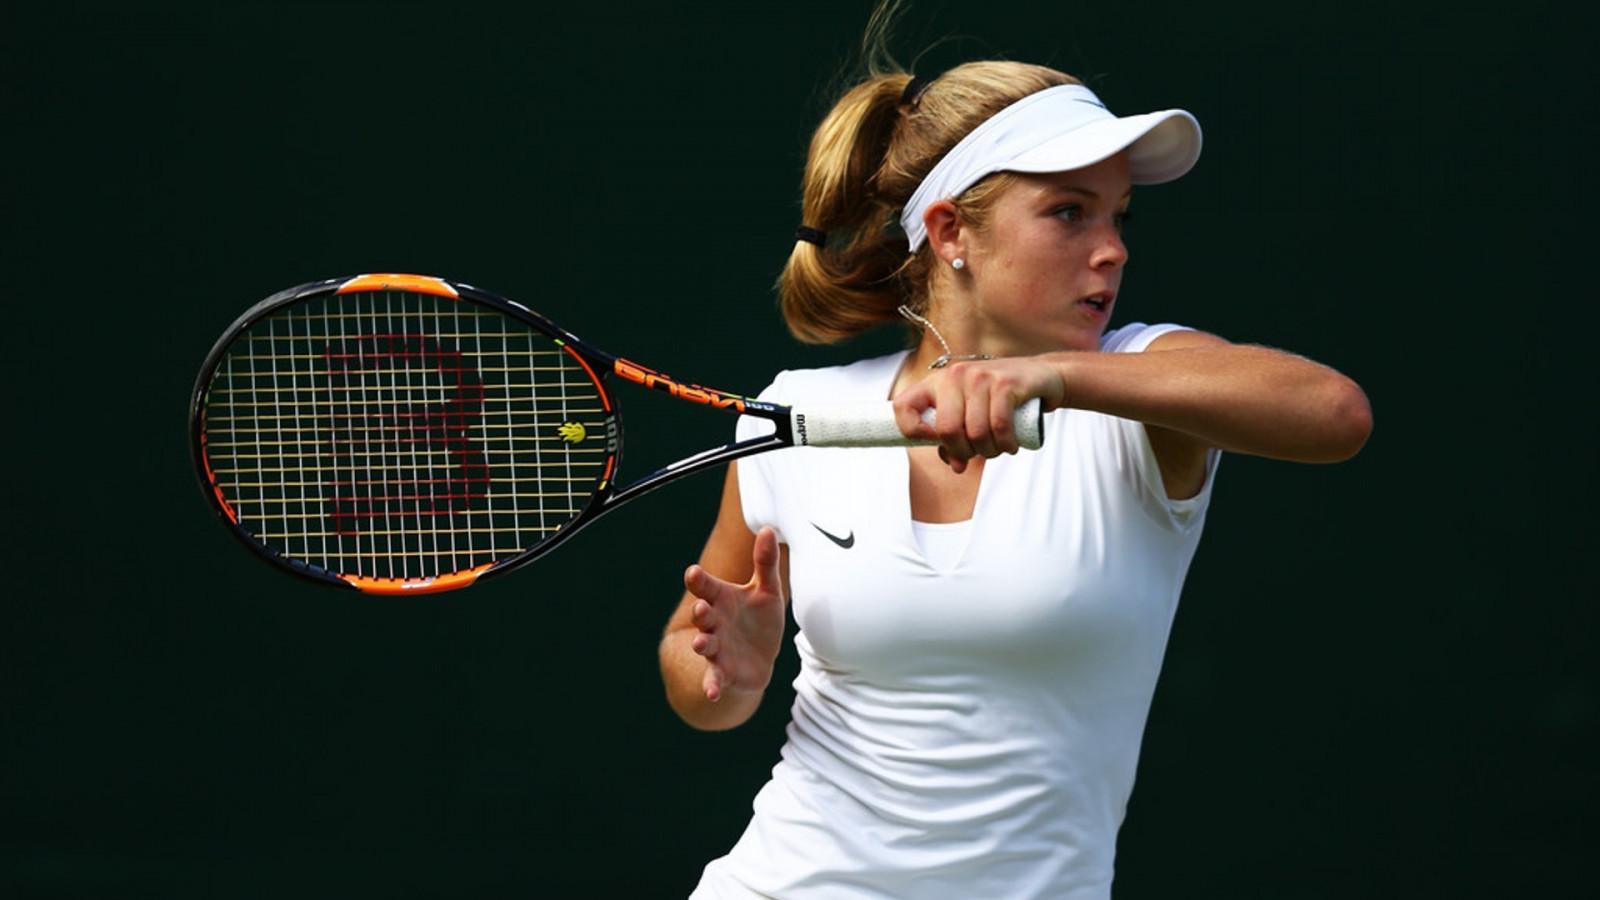 Wallpaper : Tennis Rackets, Katie Swan, 1920x1080 Px